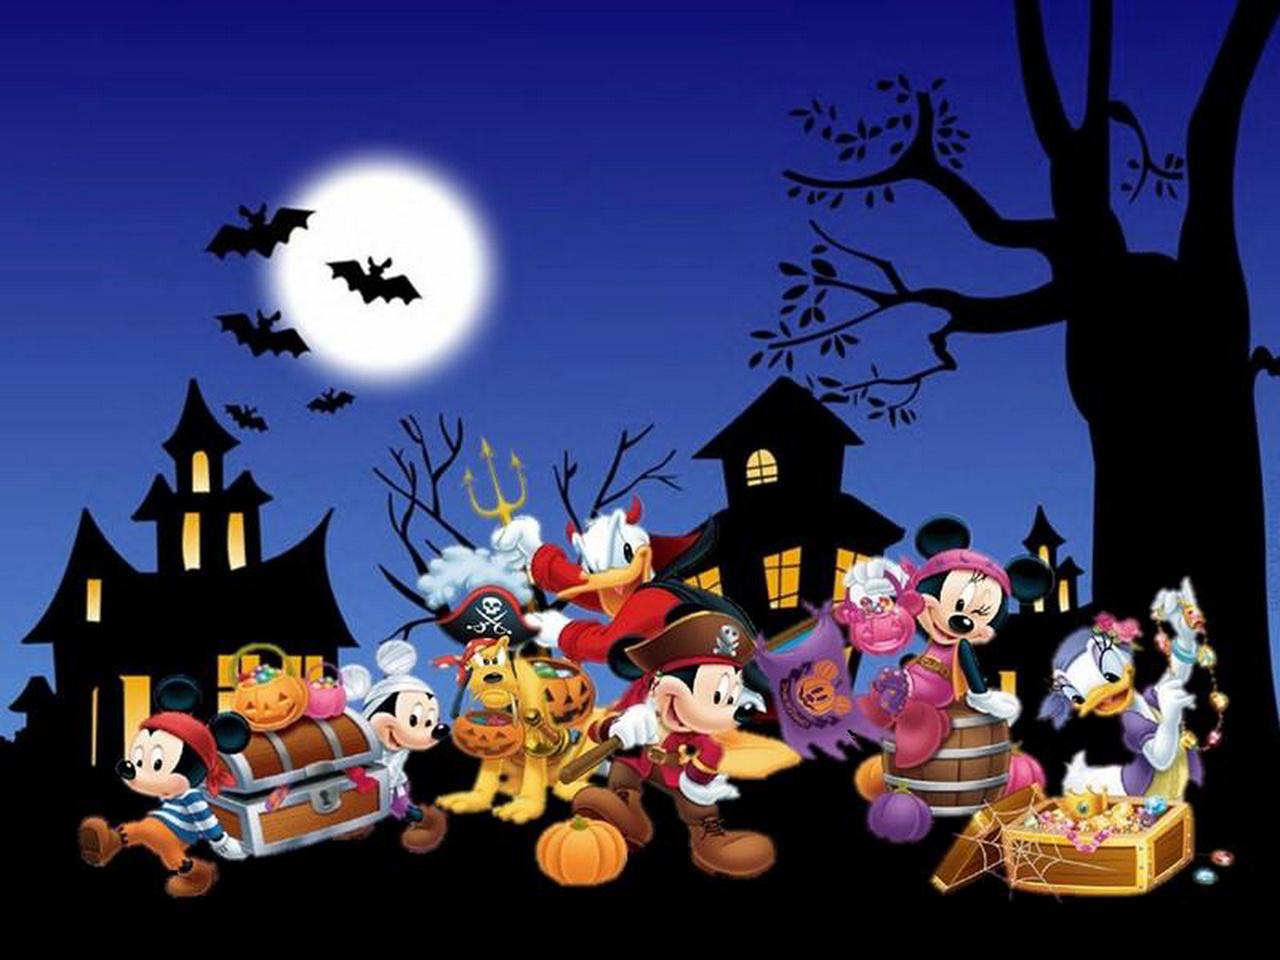 Free Halloween Animated Desktop Wallpaper - WallpaperSafari